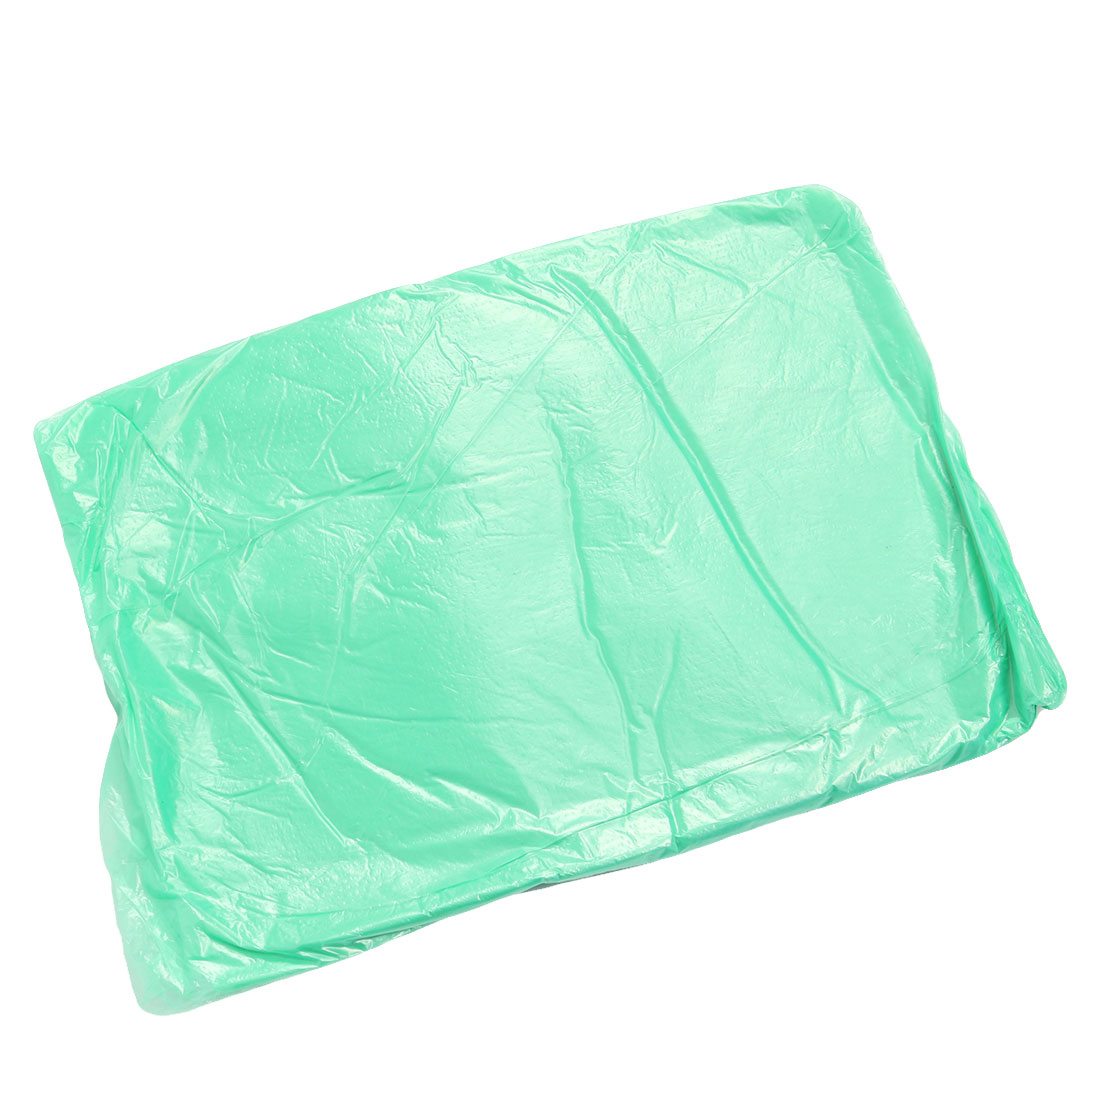 Unisex PVC Plastic Disposable Water Resistant Outdoor Poncho Raincoat Green 10pcs